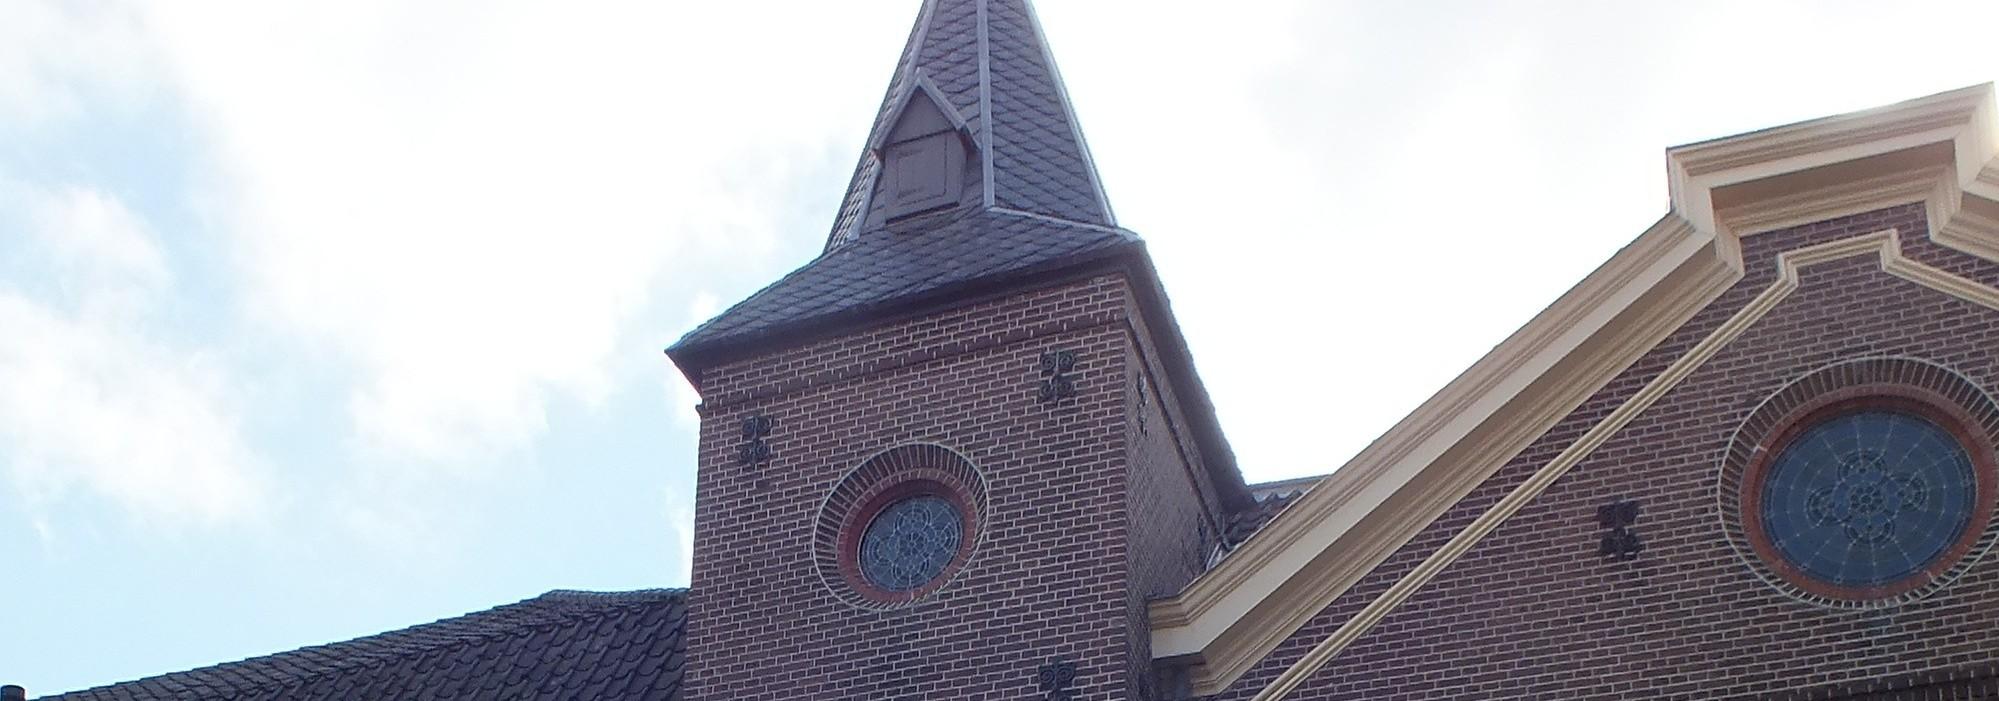 Oude convent Zutphen